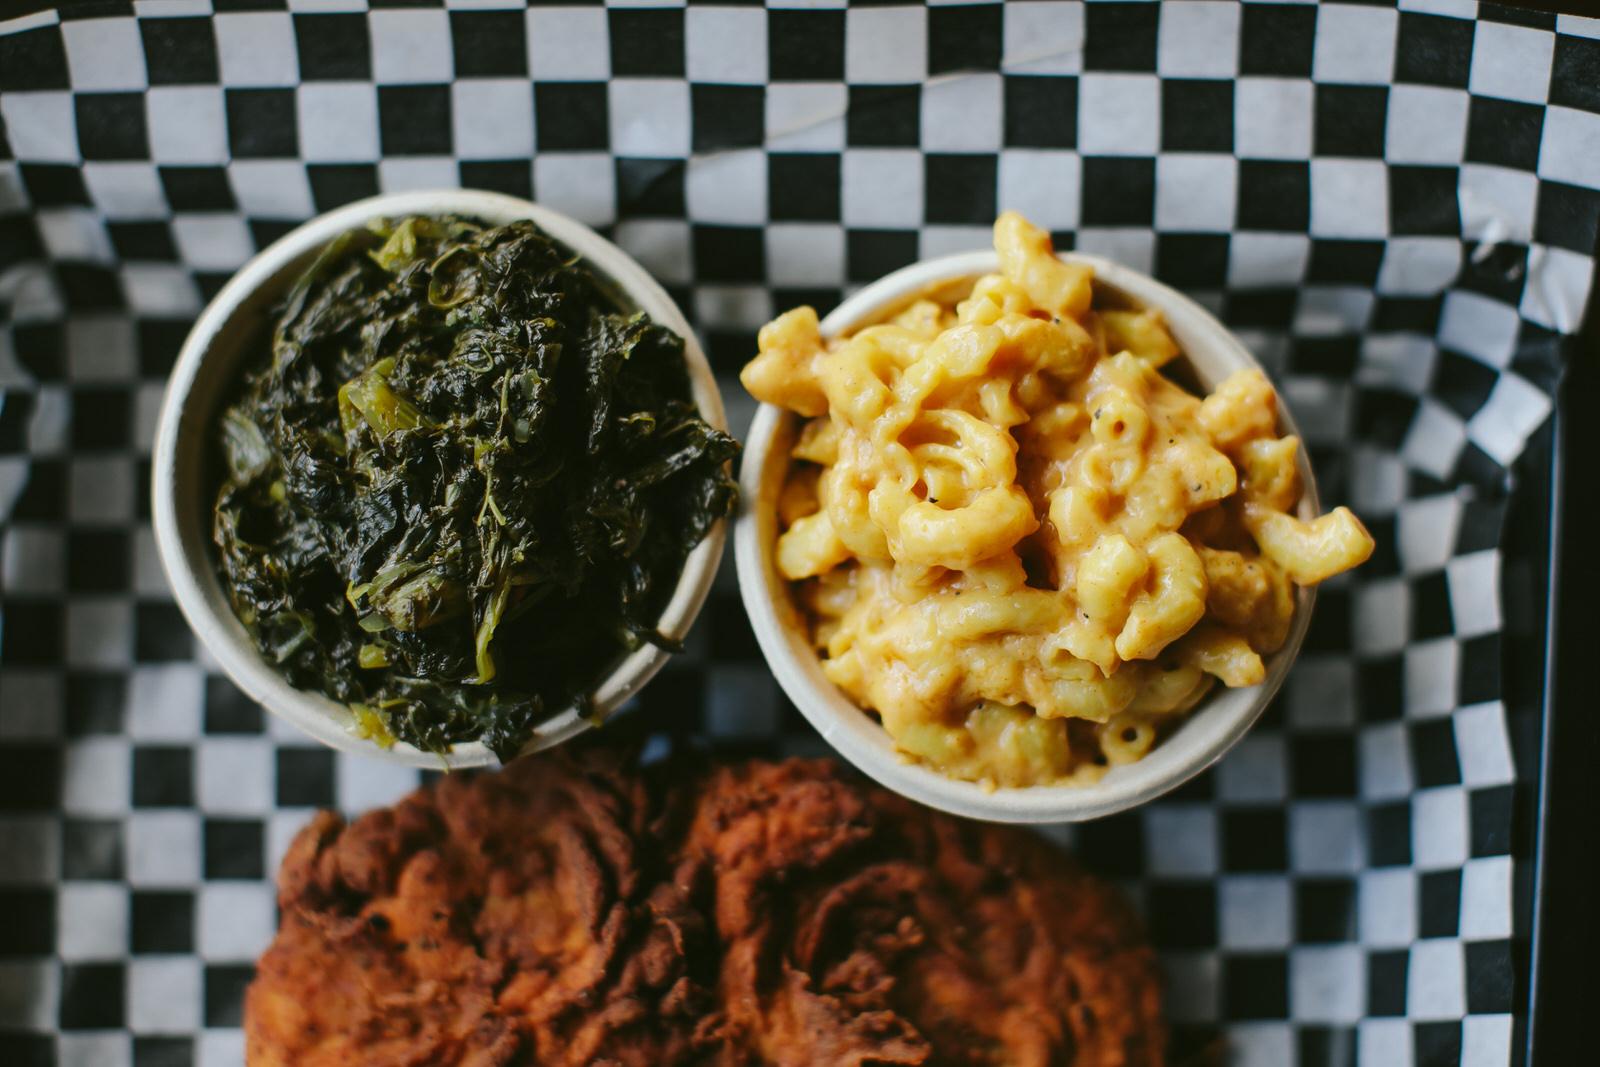 southern-v-nashville-vegan-food-vegancation-tiny-house-photo-mac-cheese-collards.jpg